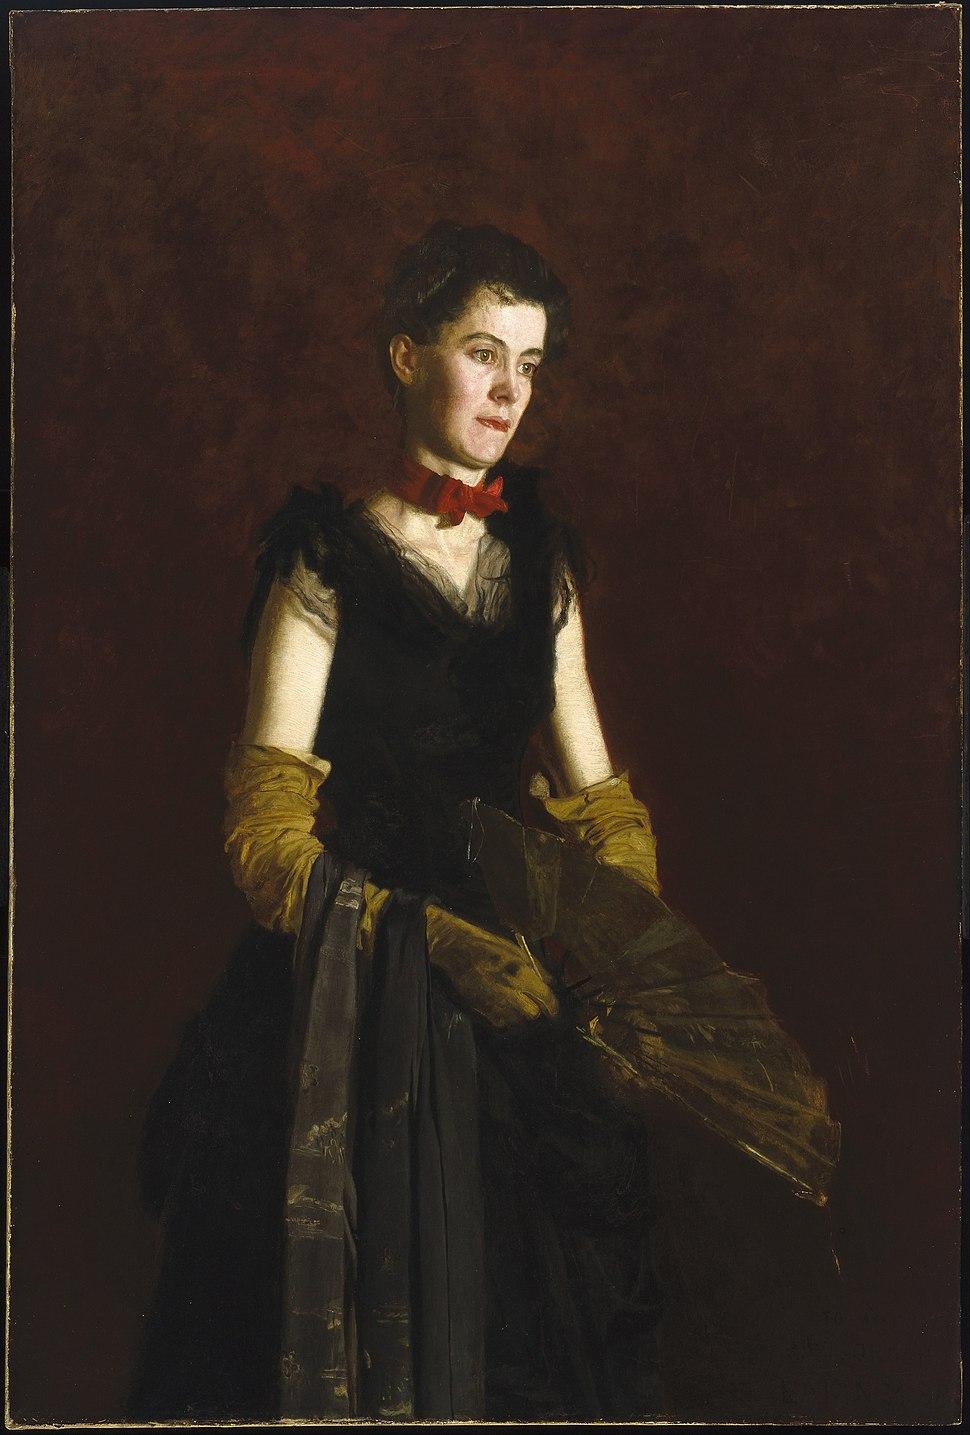 Thomas Eakins - Letitia Wilson Jordan - Google Art Project